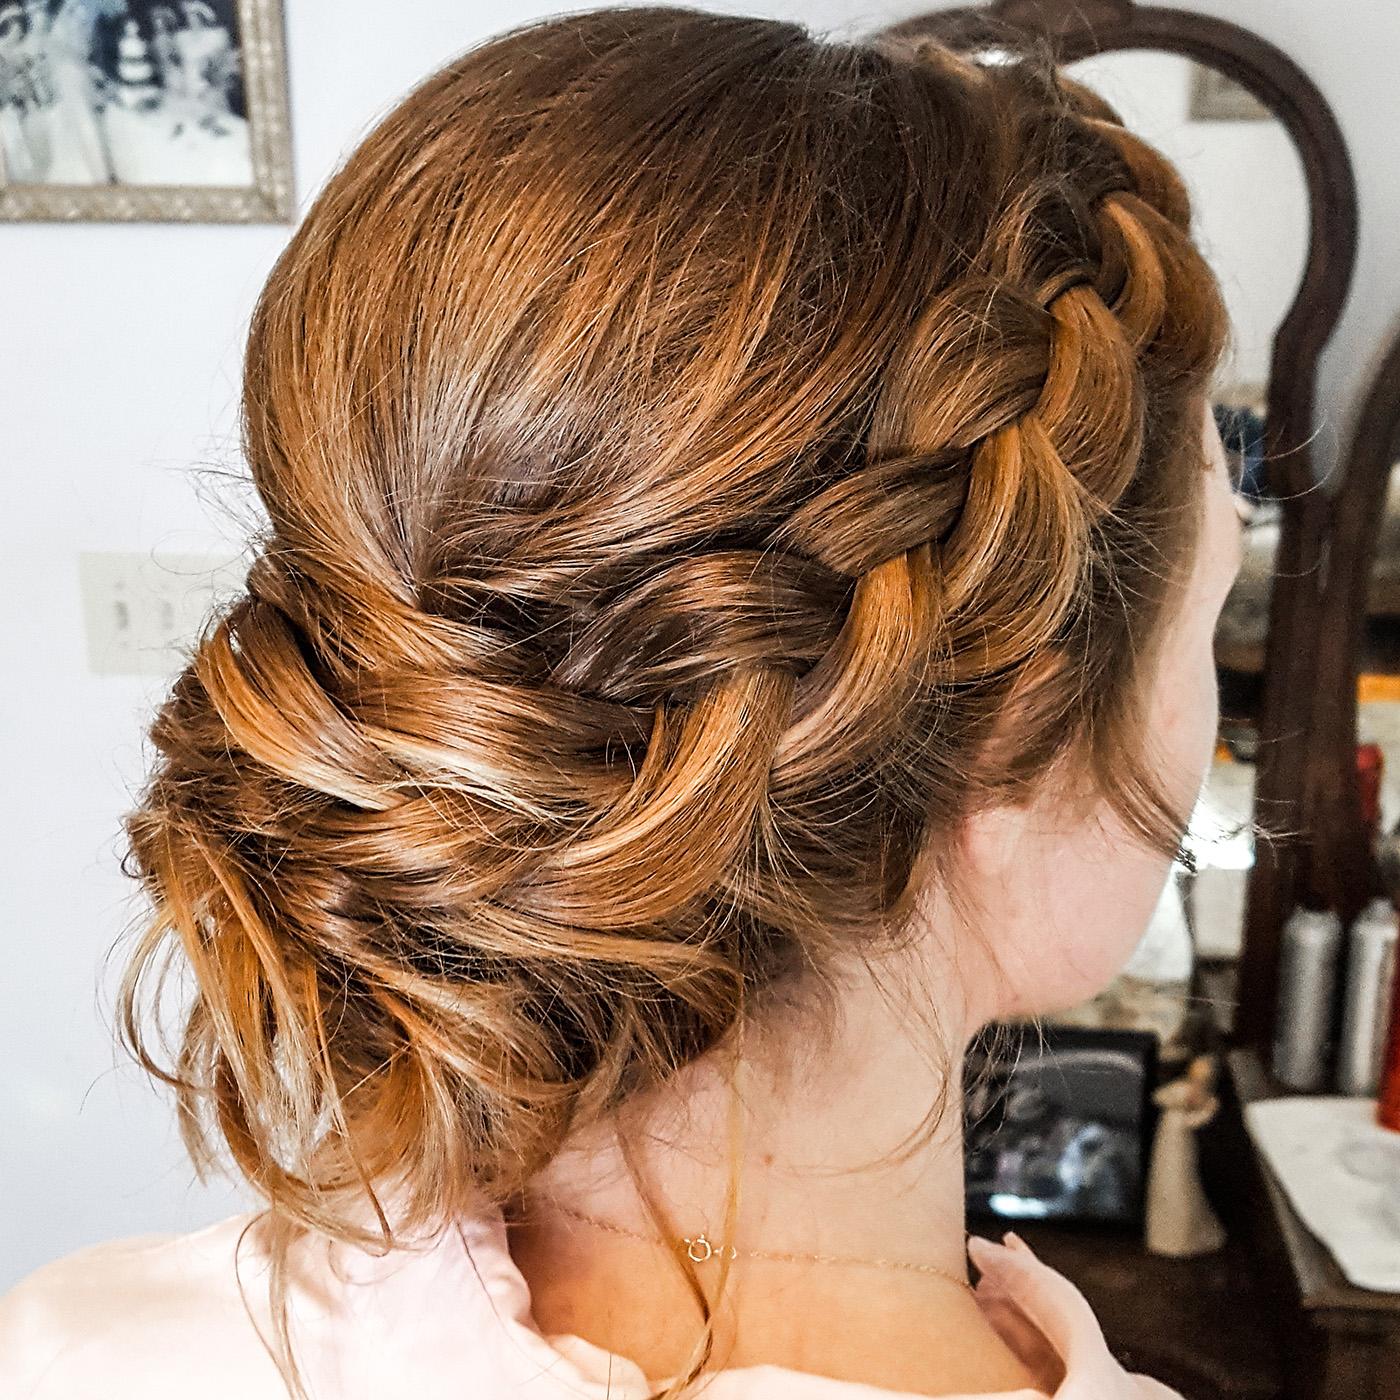 Melanie Sorrow Hair